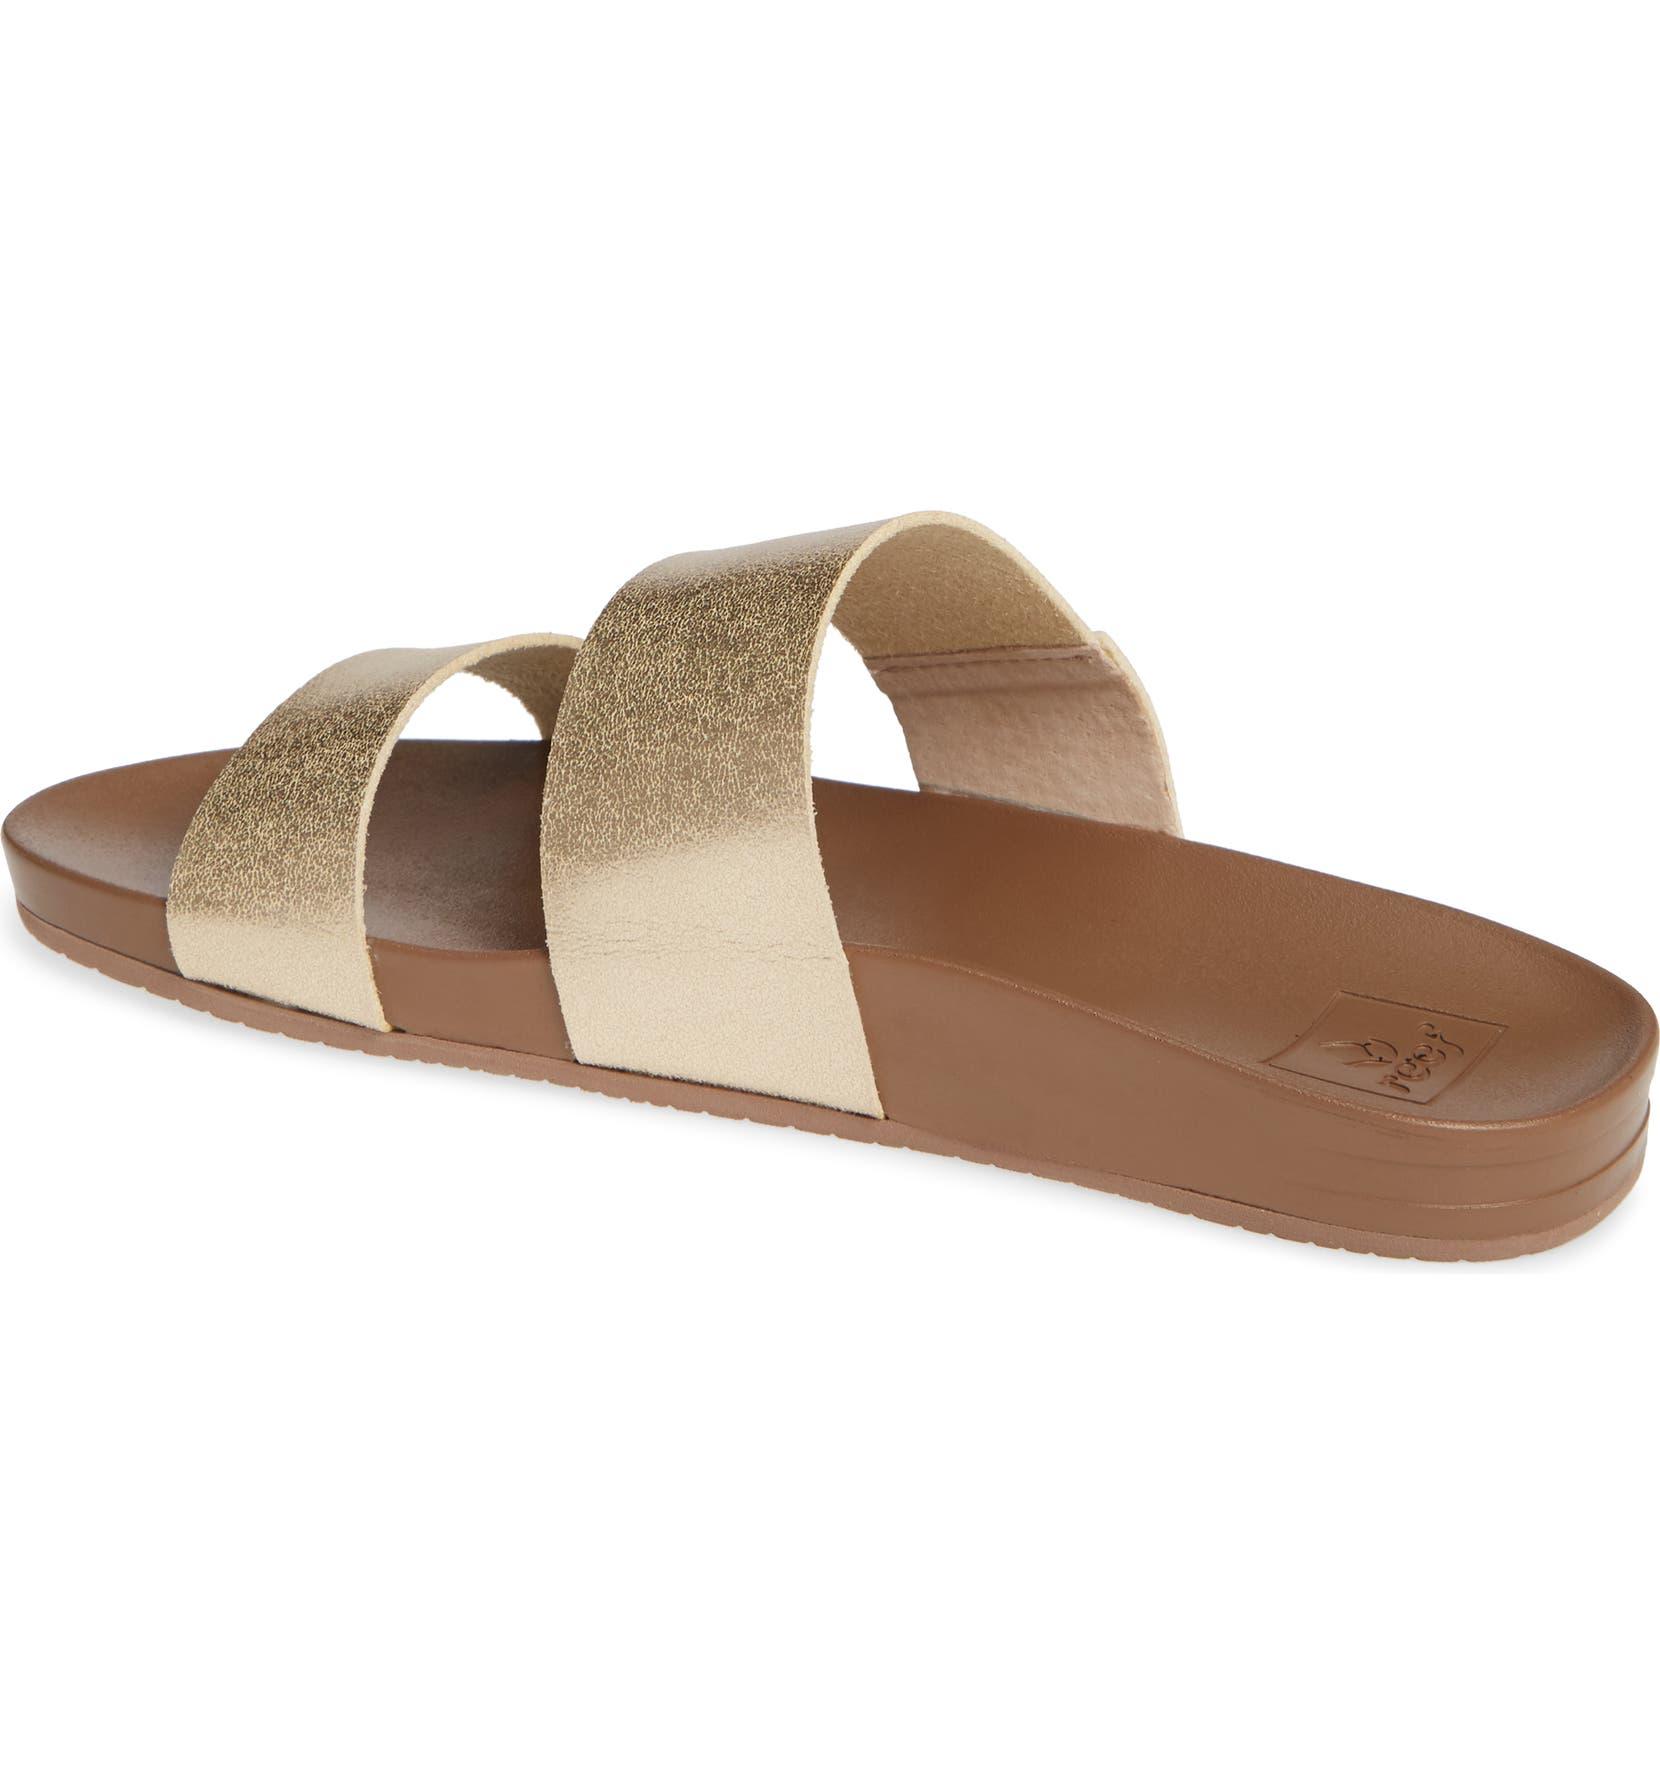 c30b1eace160 Reef Cushion Bounce Vista Slide Sandal (Women)